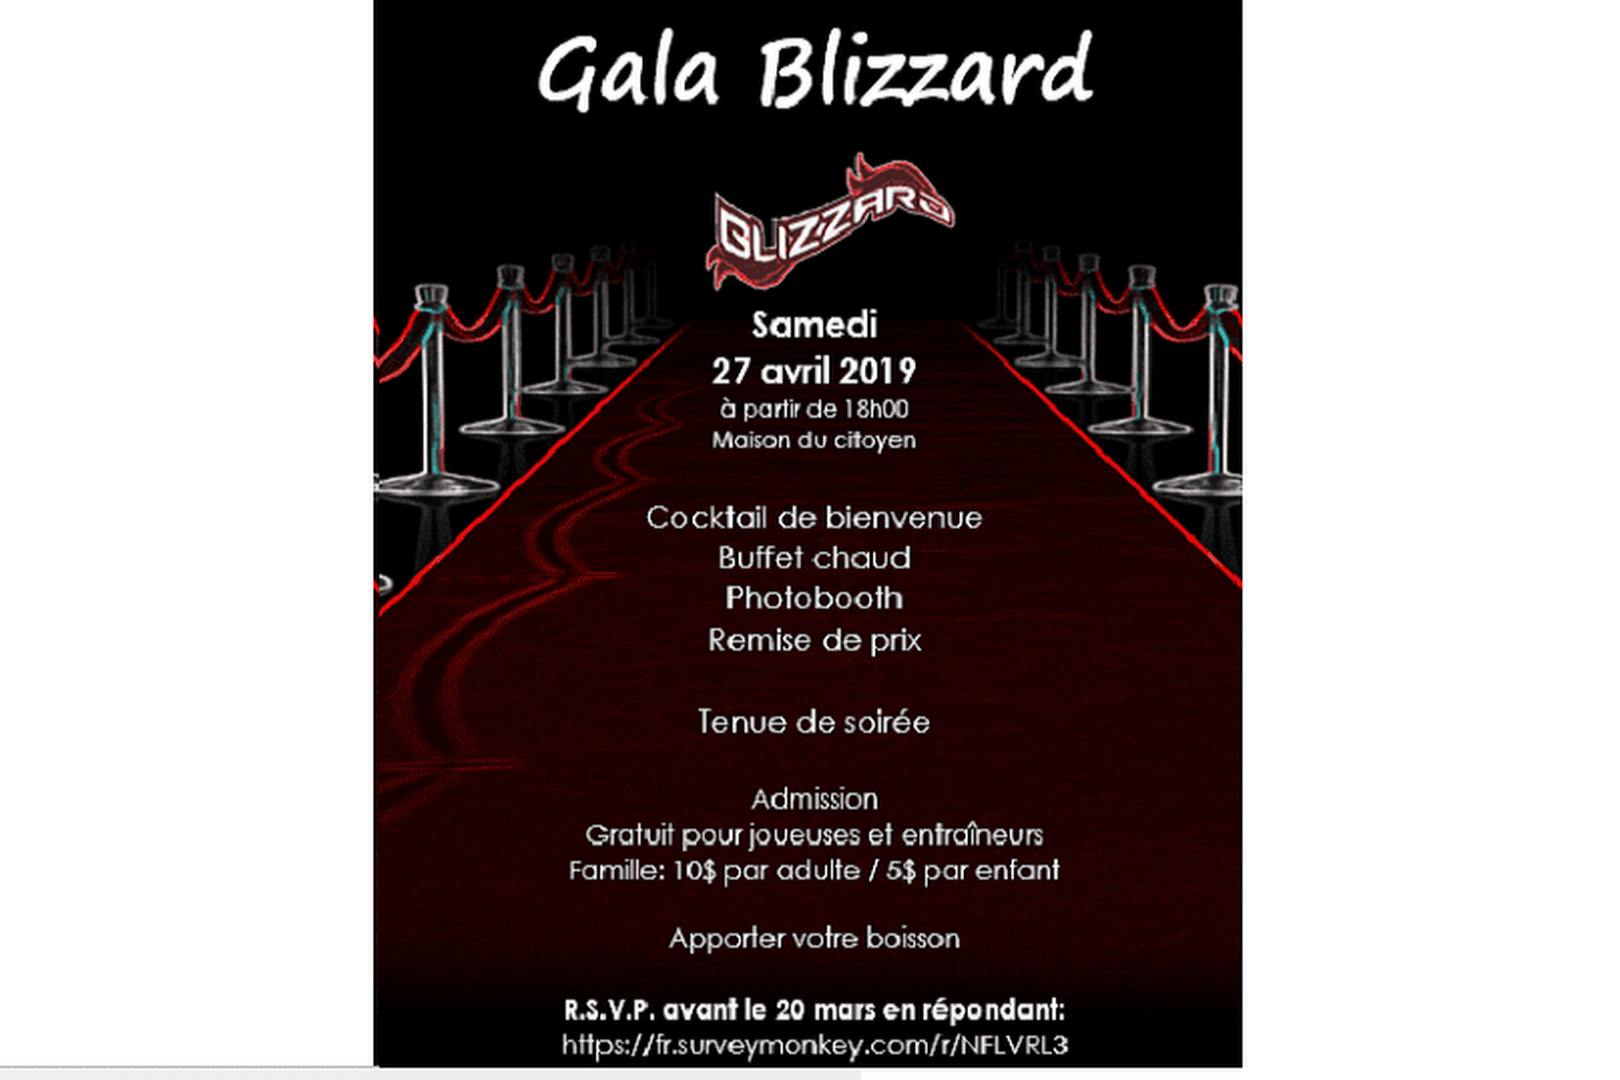 Gala Blizzard !!